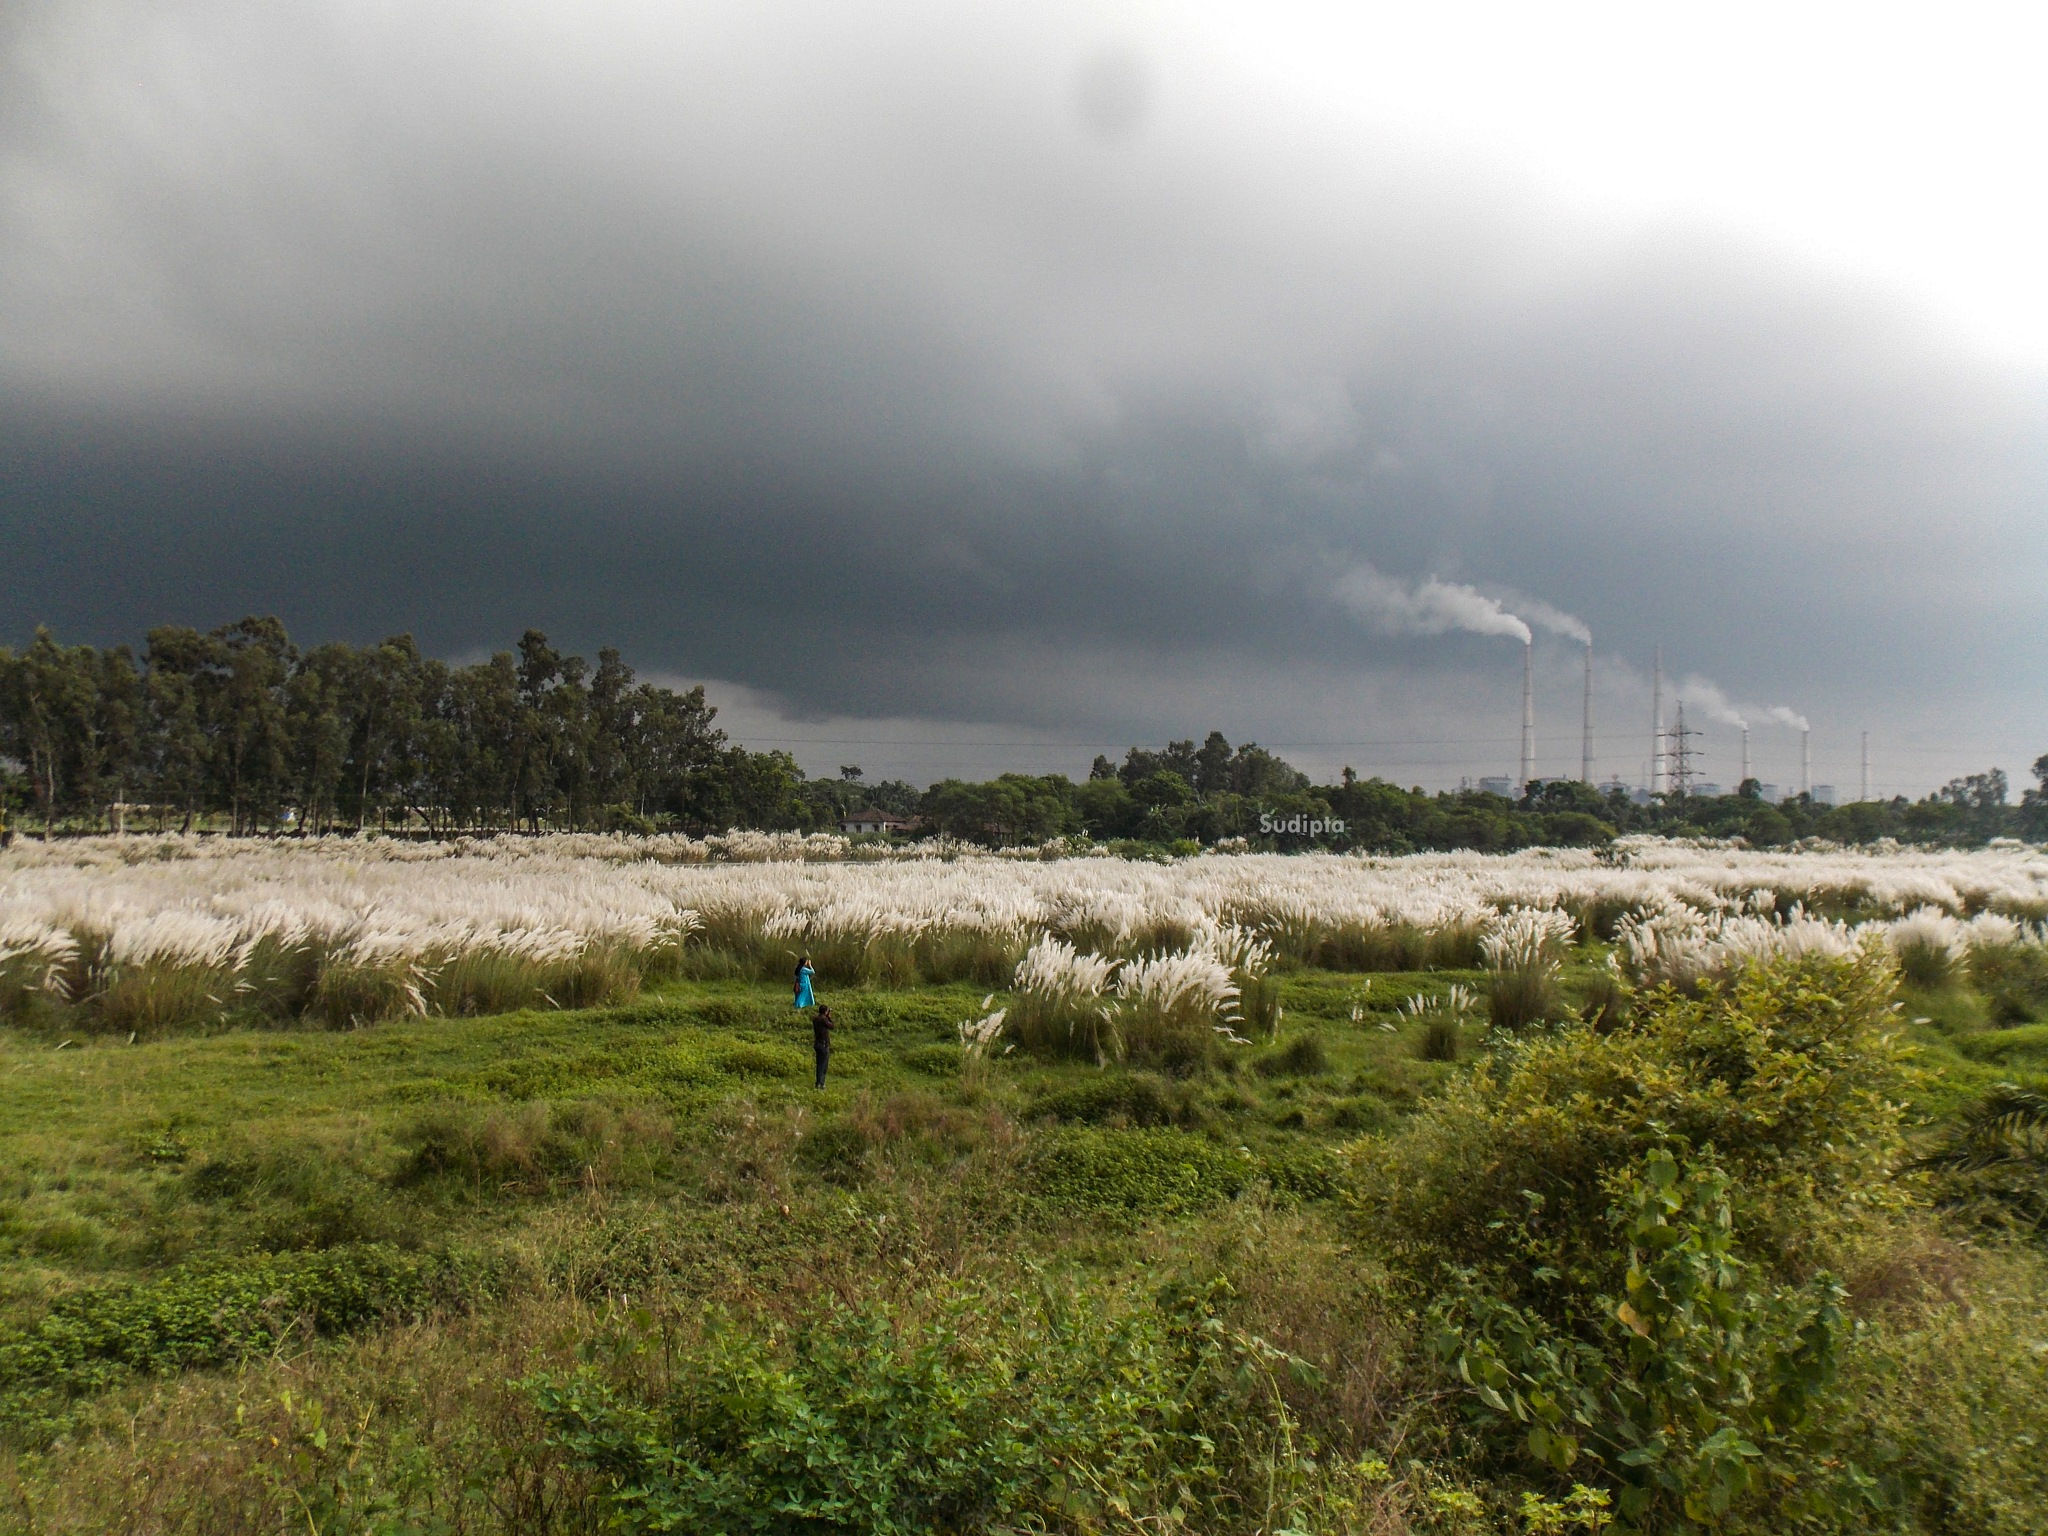 LANDSCAPE by Sudipta Mukherjee